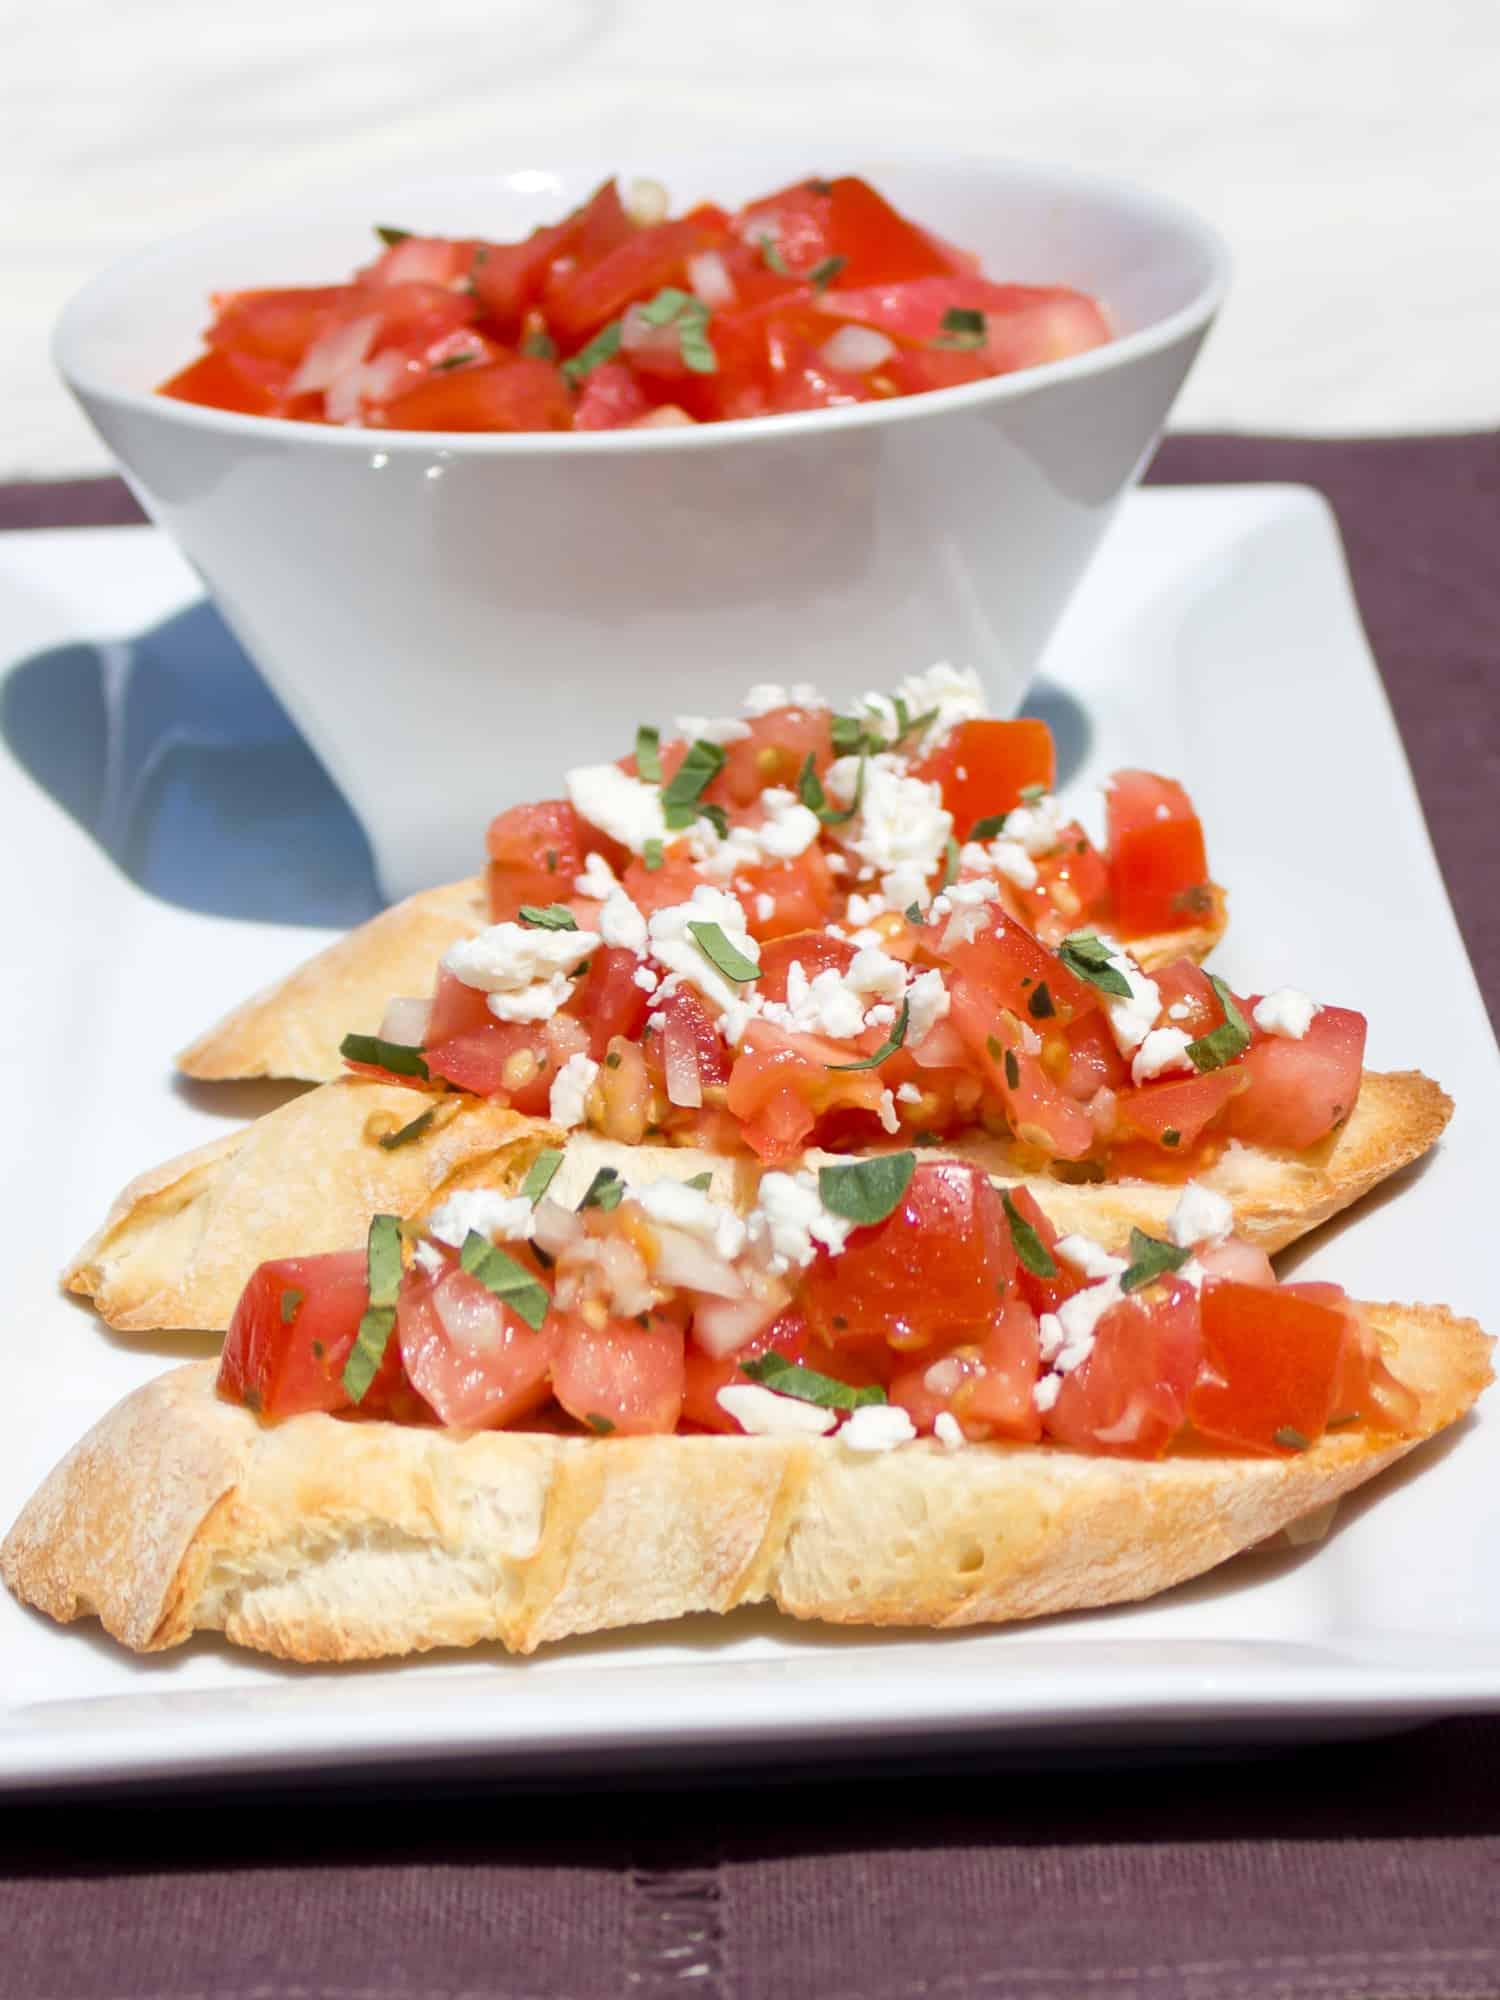 Make tomato bruschetta bread right at home with this simple recipe.